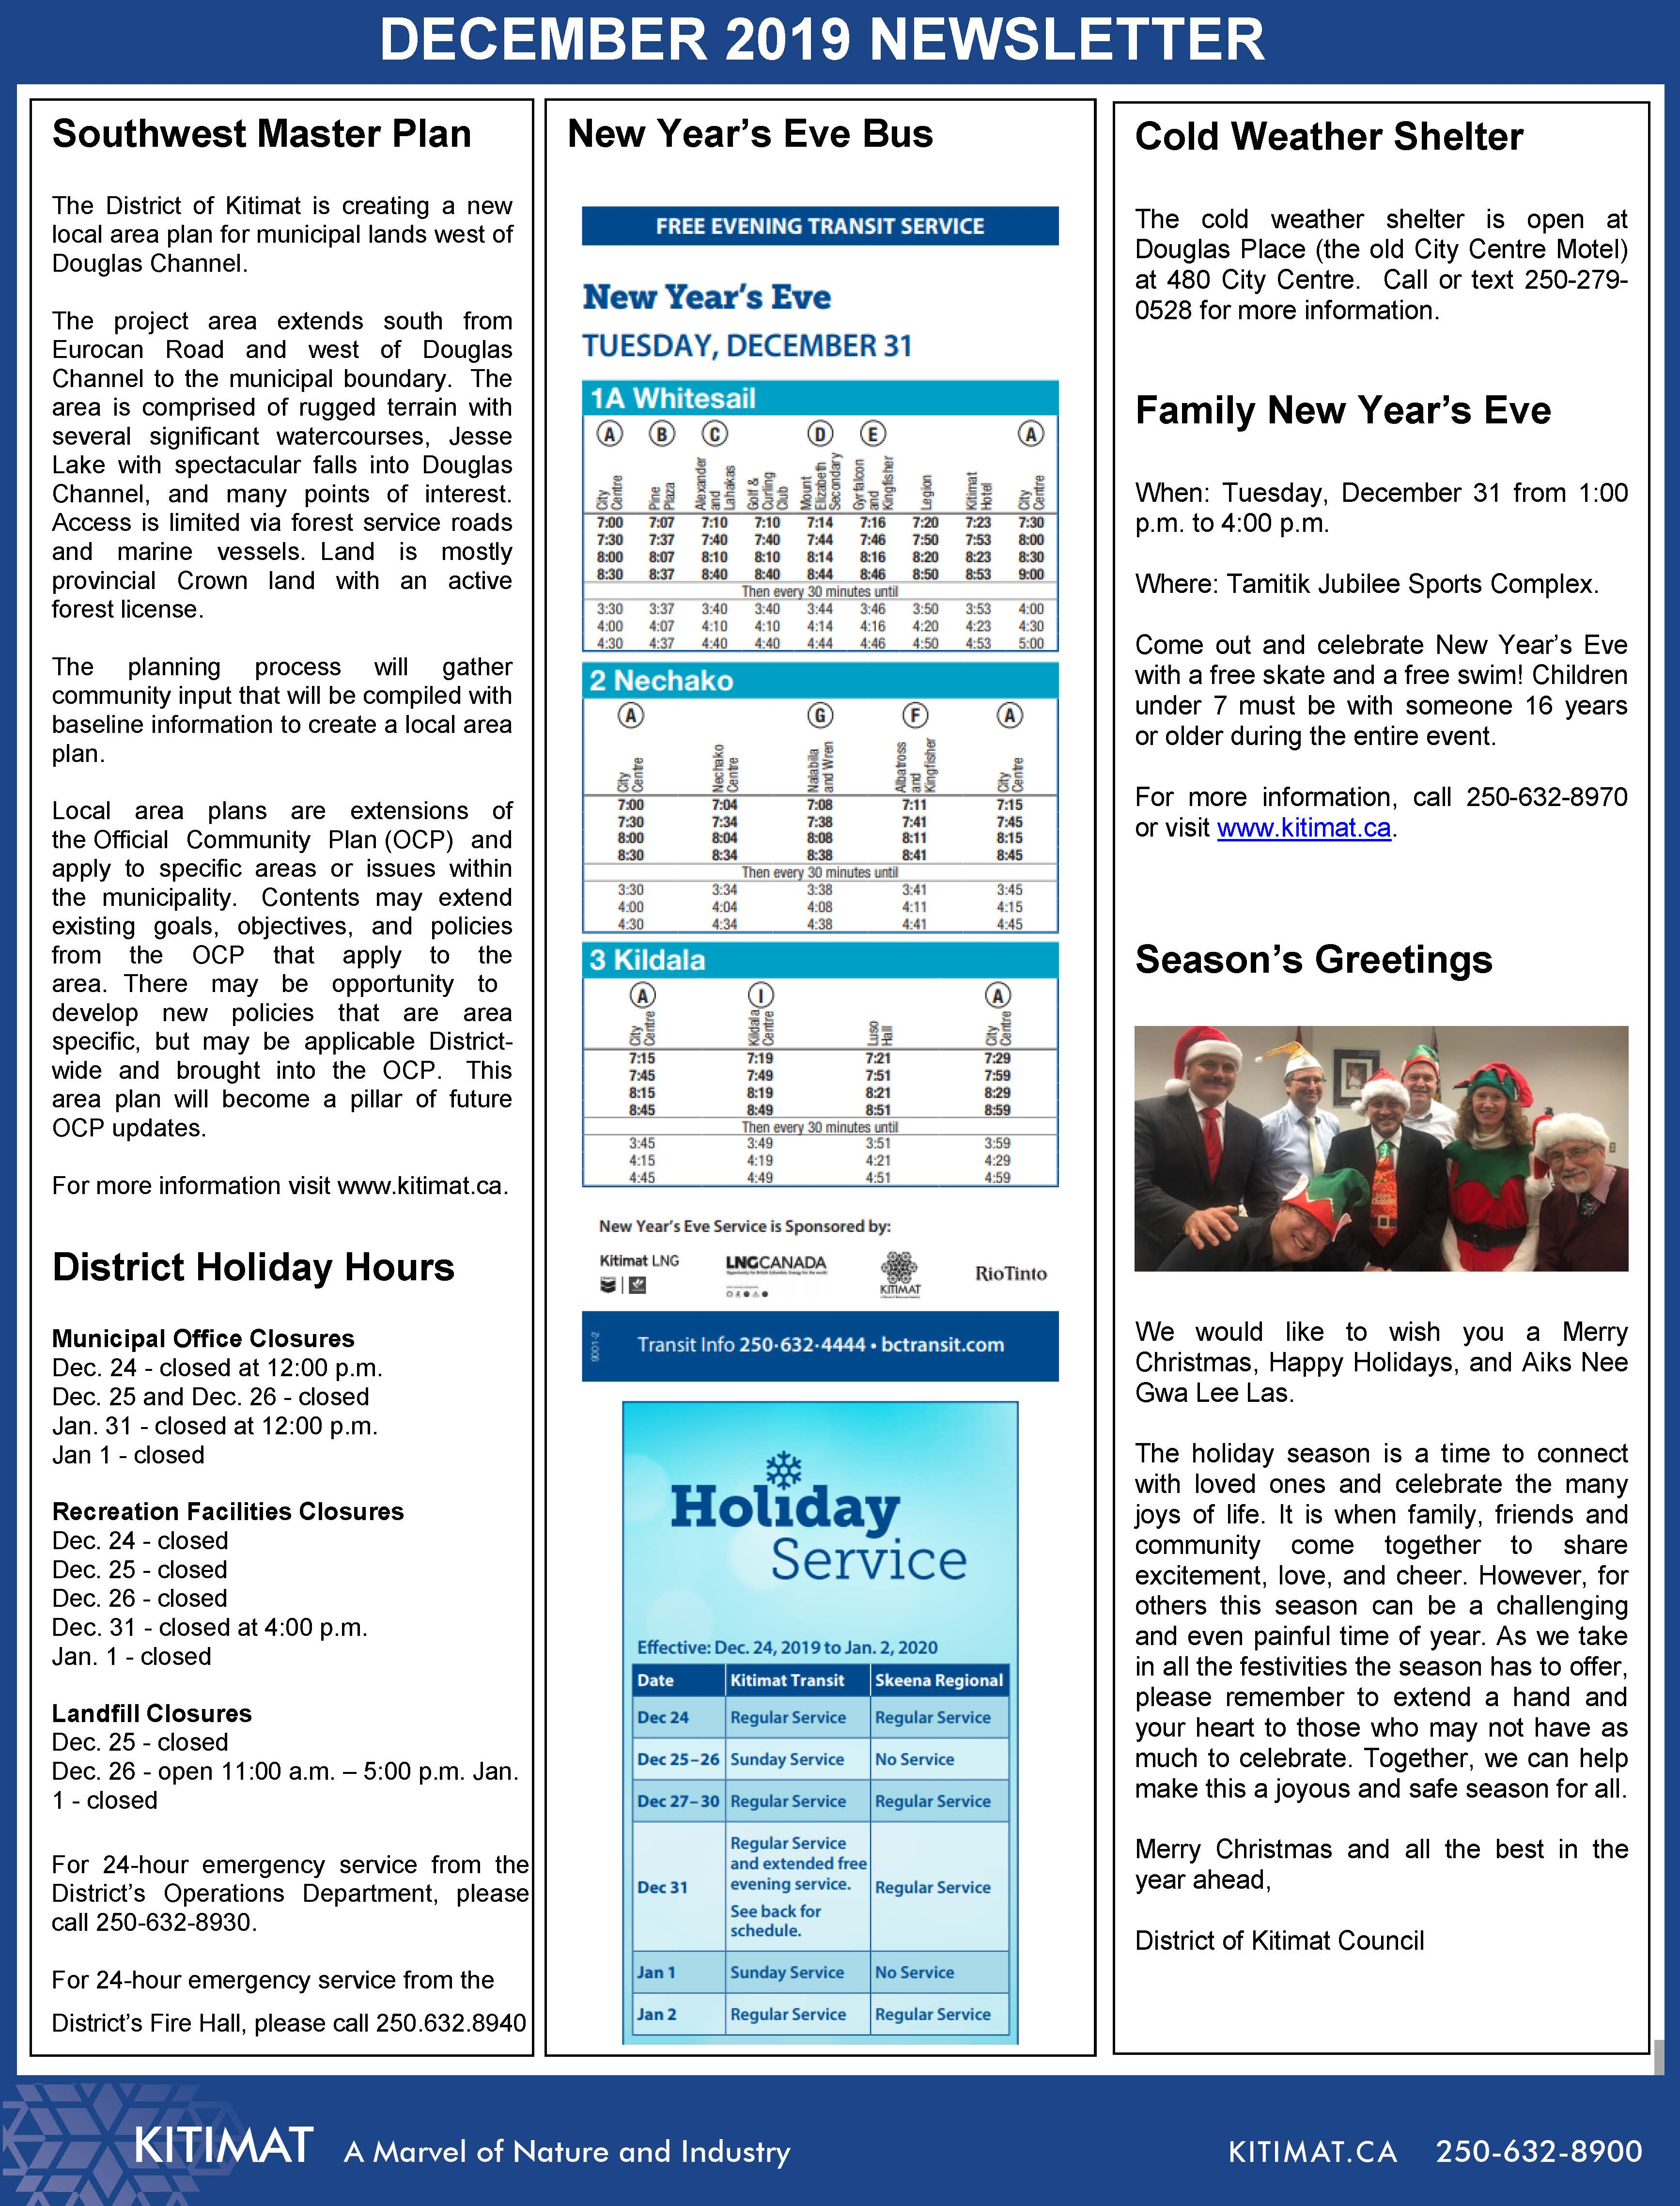 Dec 2019 DOK Newsletter, pg 2 of 2